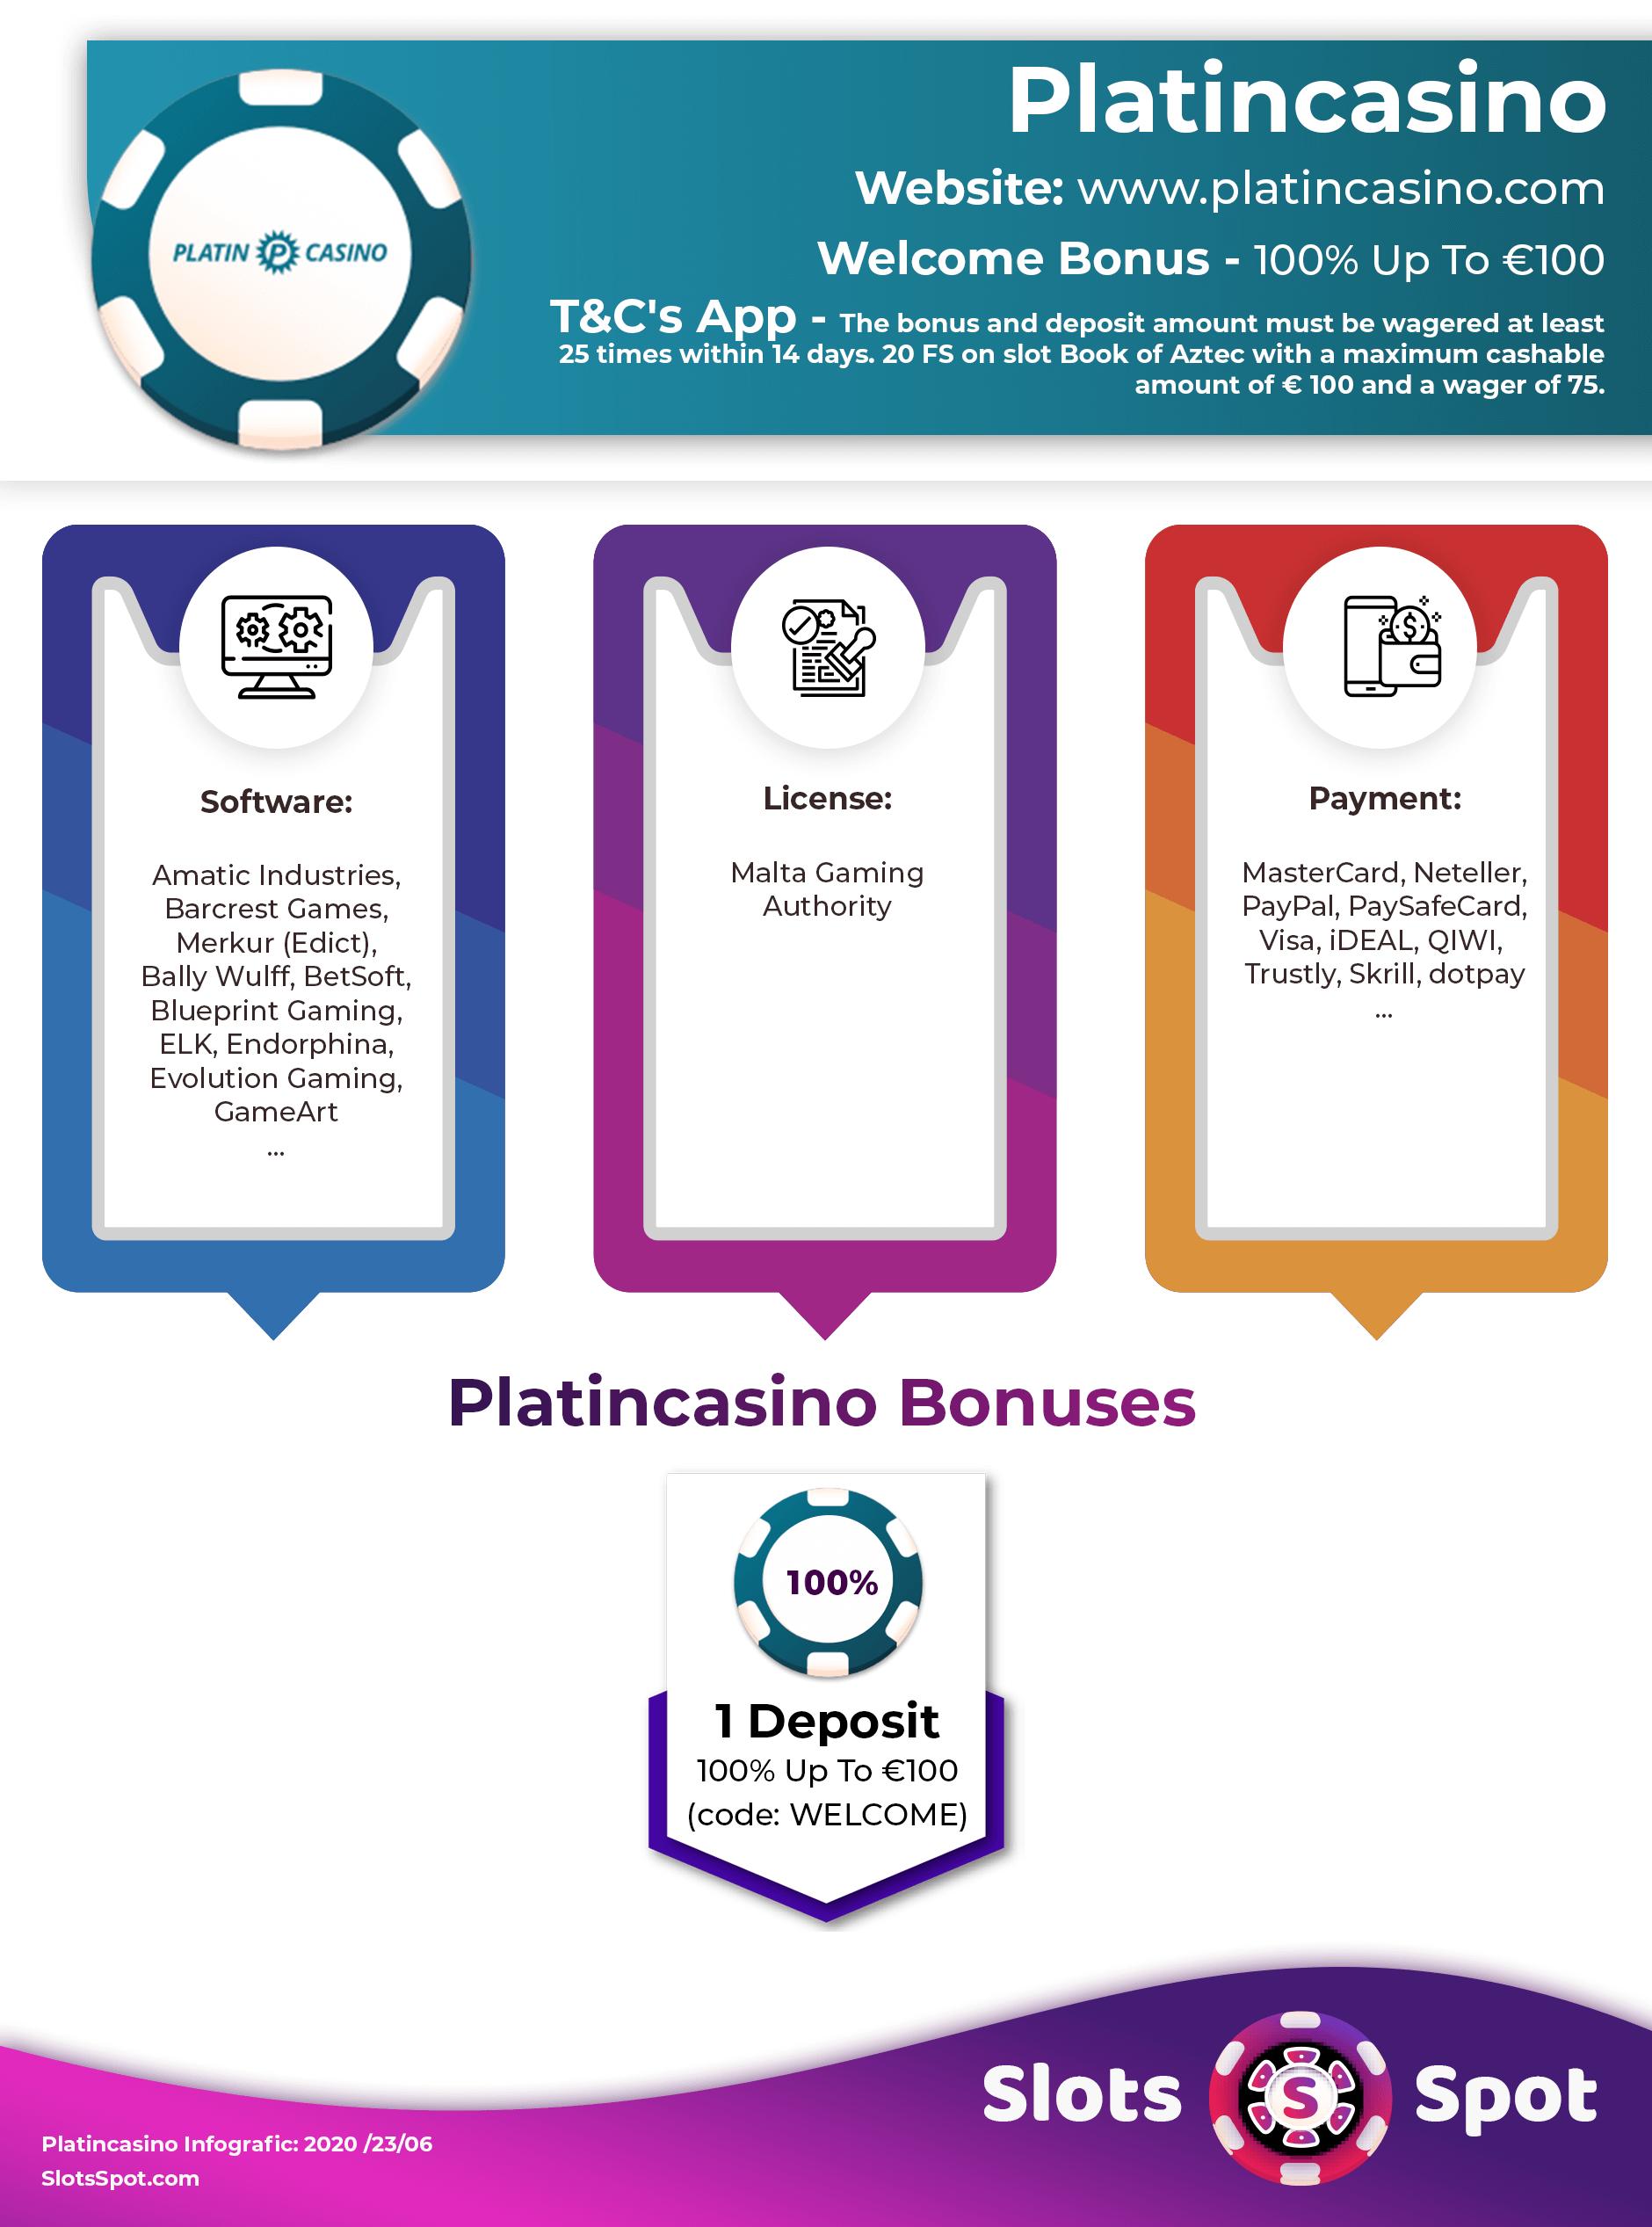 Platincasino Bonus Code